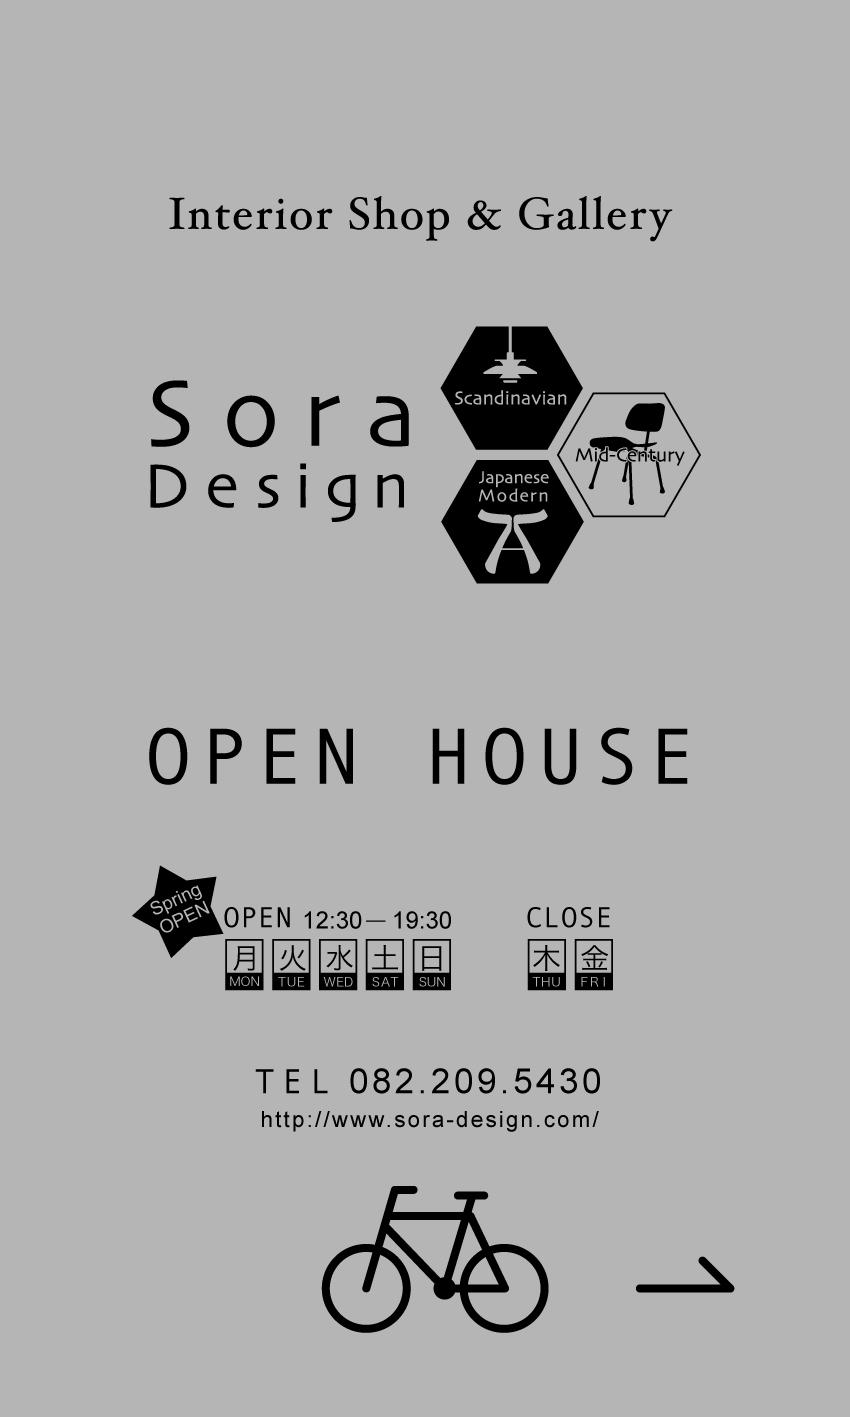 http://www.sora-design.com/images/01.jpg